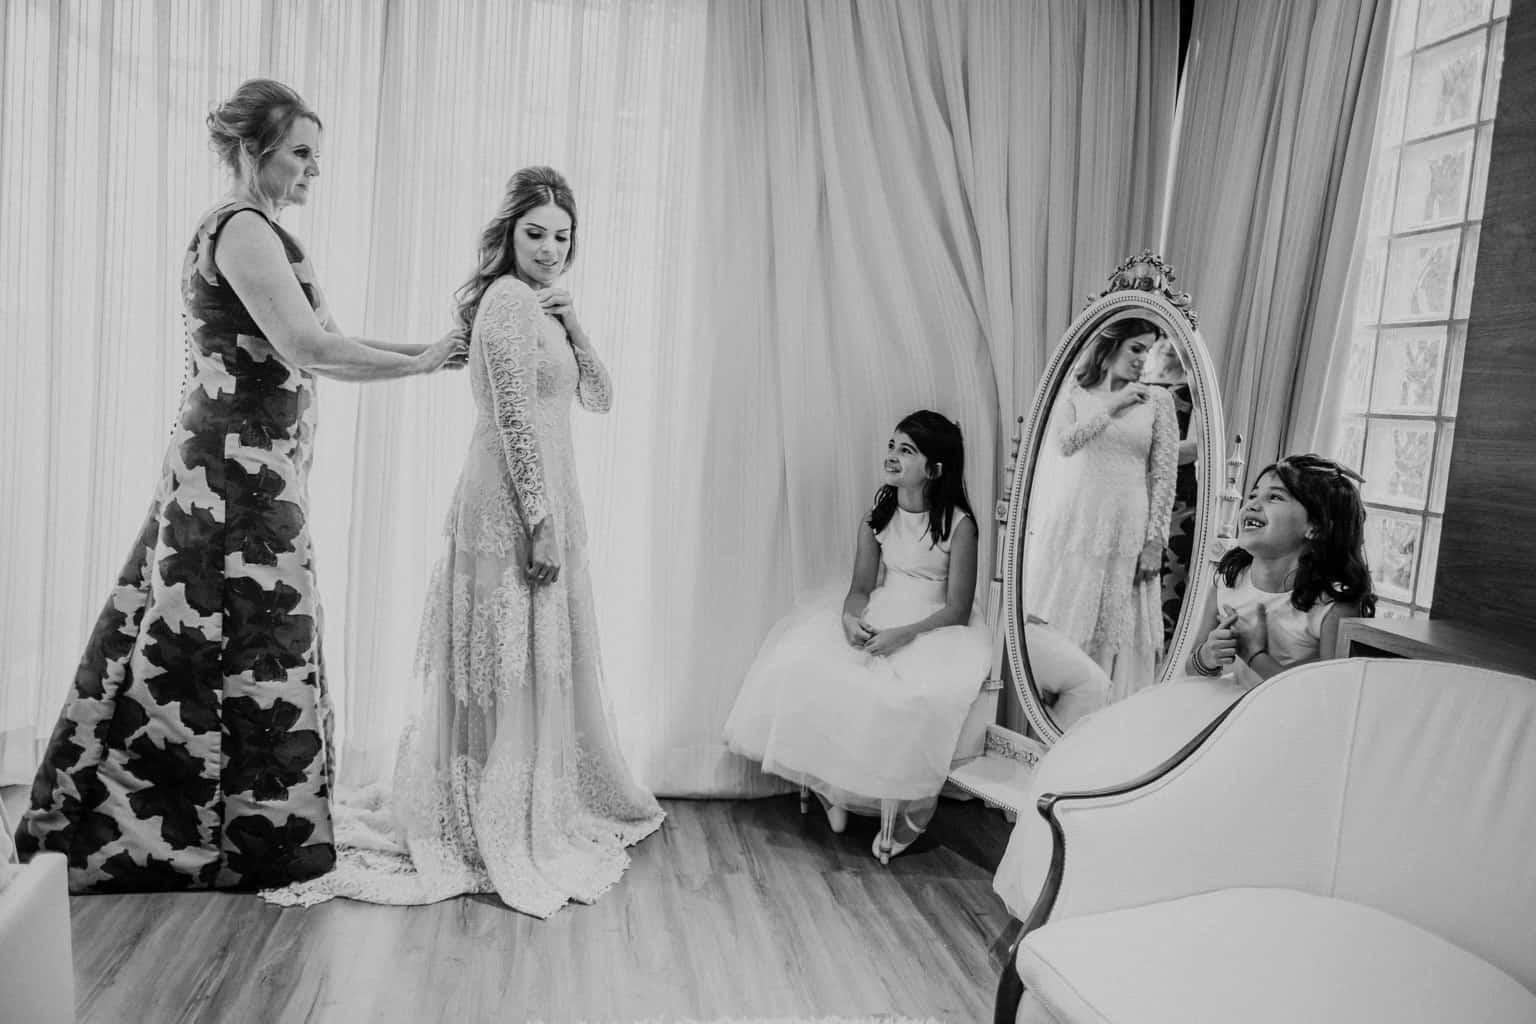 casamento-na-serra-Fotografia-Renata-Xavier-Les-Amies-Cerimonial-Locanda-Della-Mimosa-mae-da-noiva-making-of-Natalia-e-Bruno246